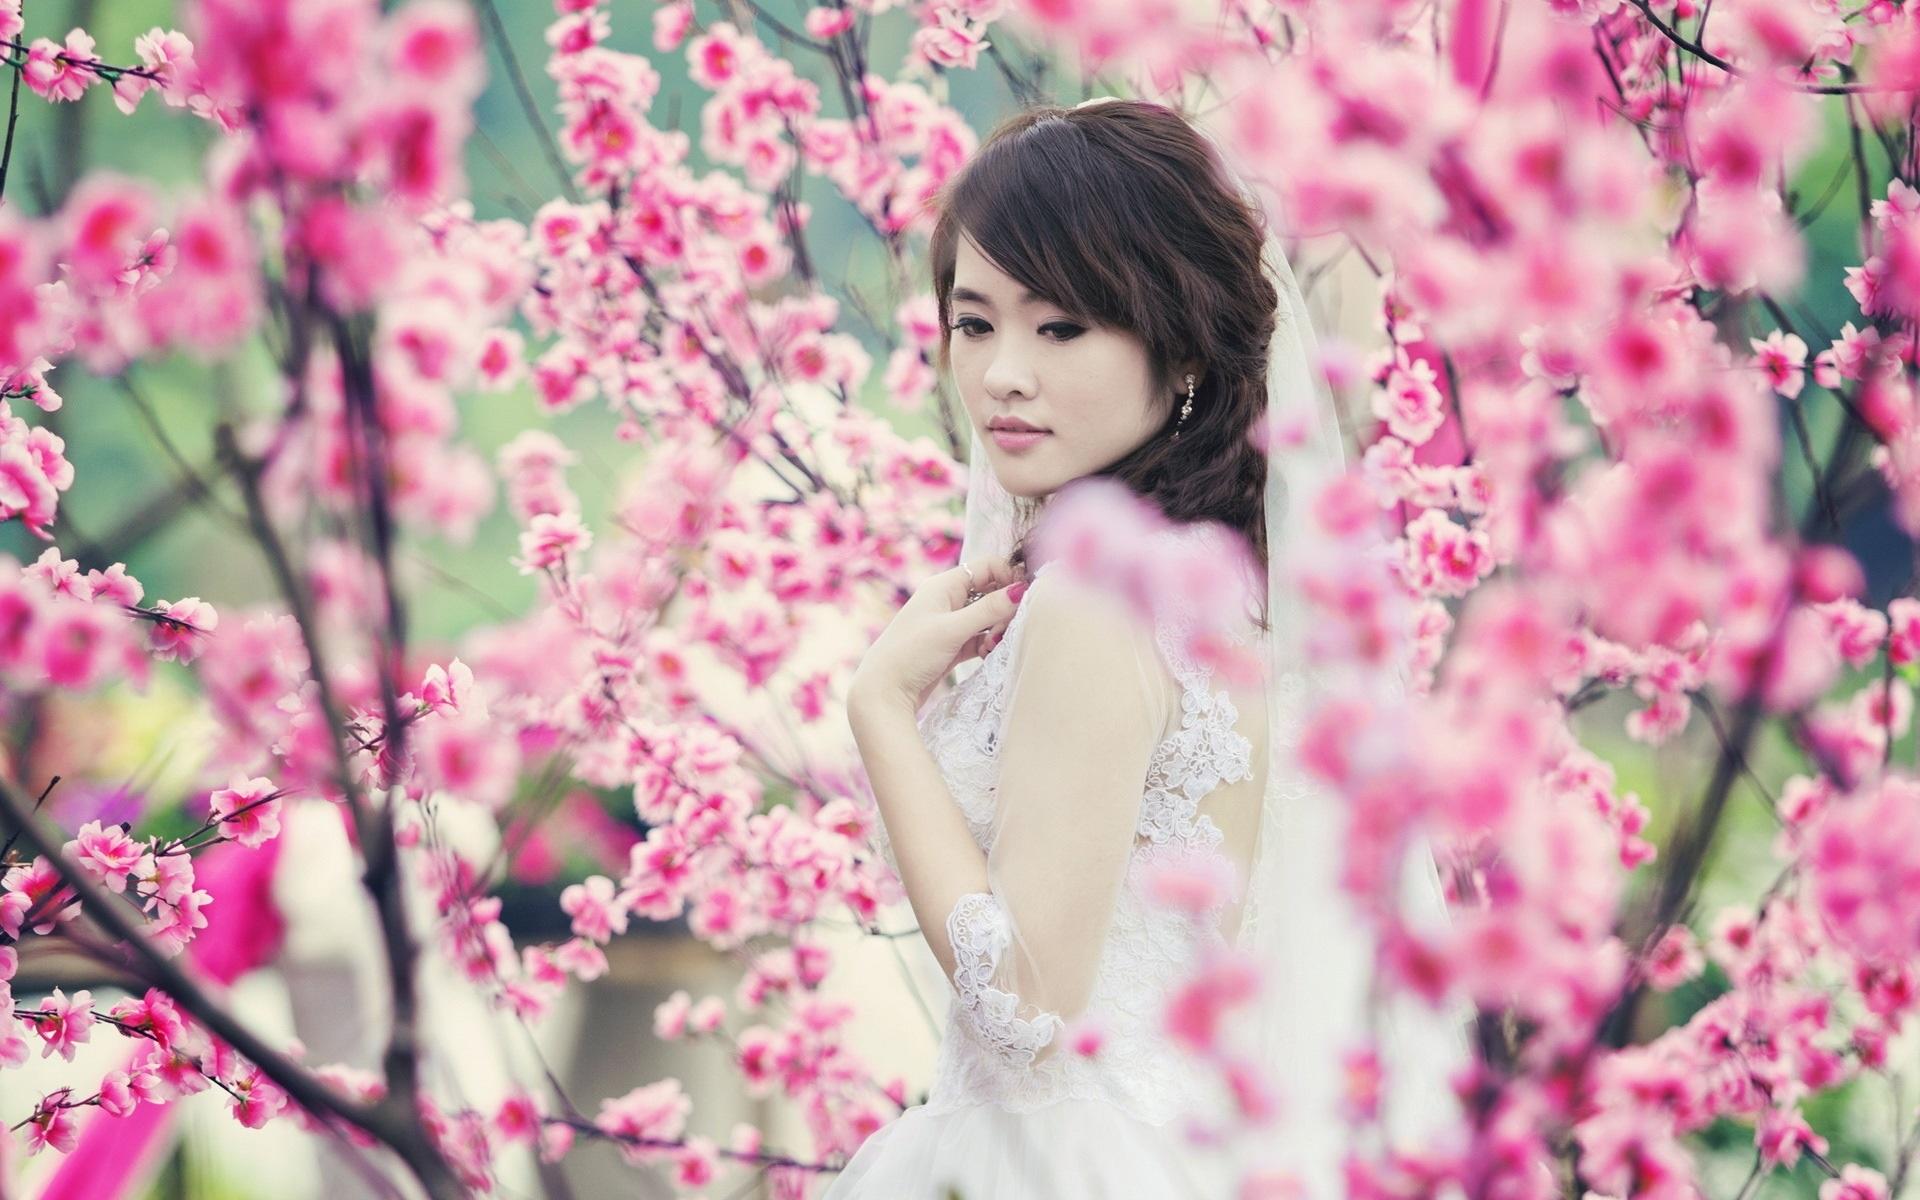 Wallpaper Of Beautiful Chinese Girl Asian Girl Garden Spring Pink Flowers Wallpaper Girls